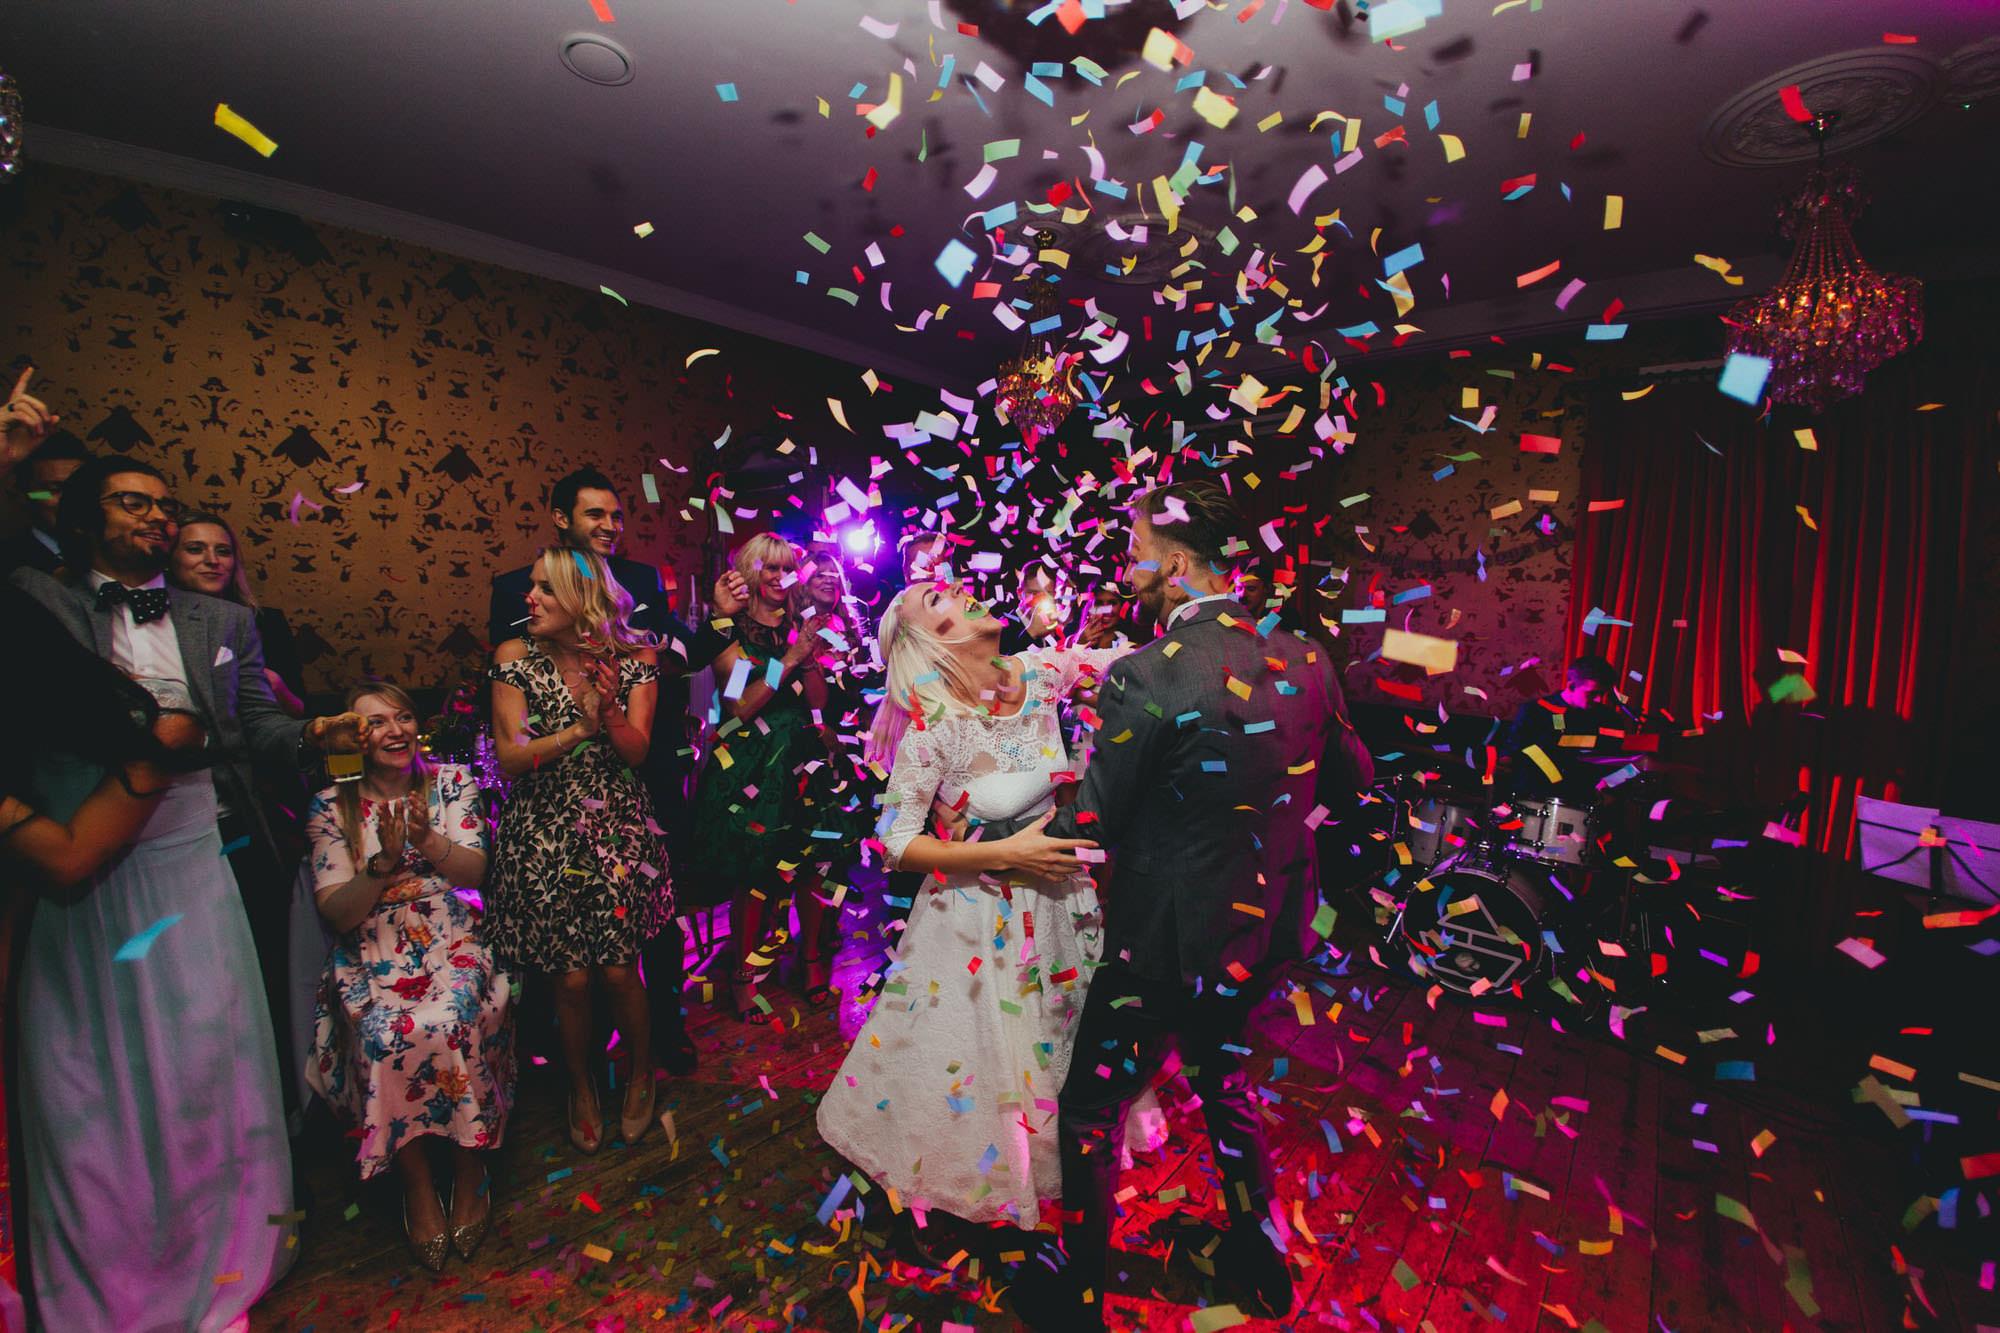 Dale Weeks Photography - Alternative, creative wedding photos